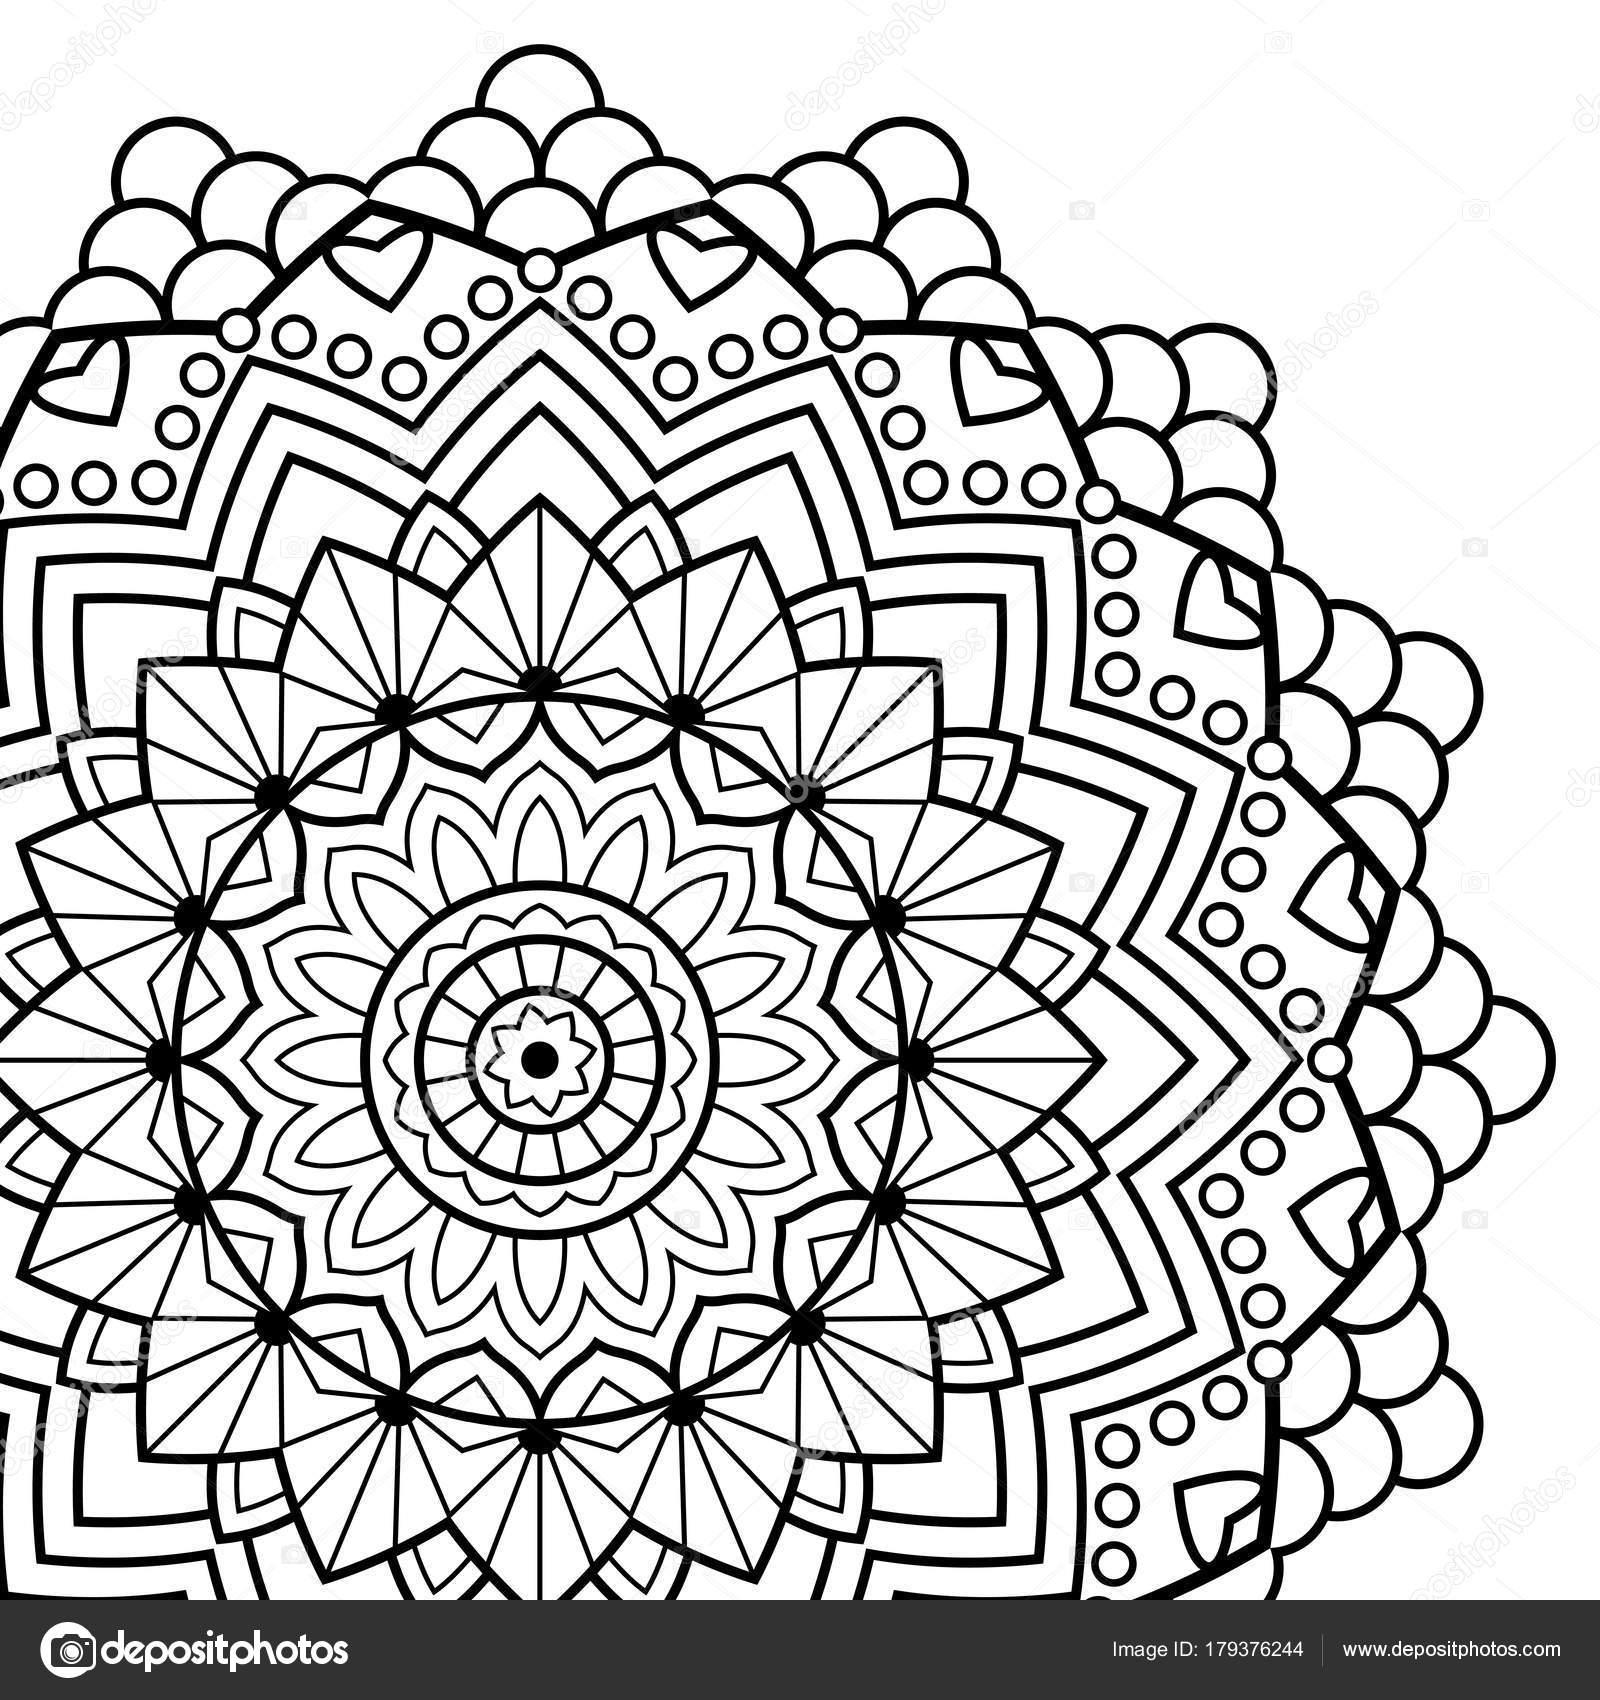 Malvorlagen Buch. Mandala. Indische antistress Medaillon ...